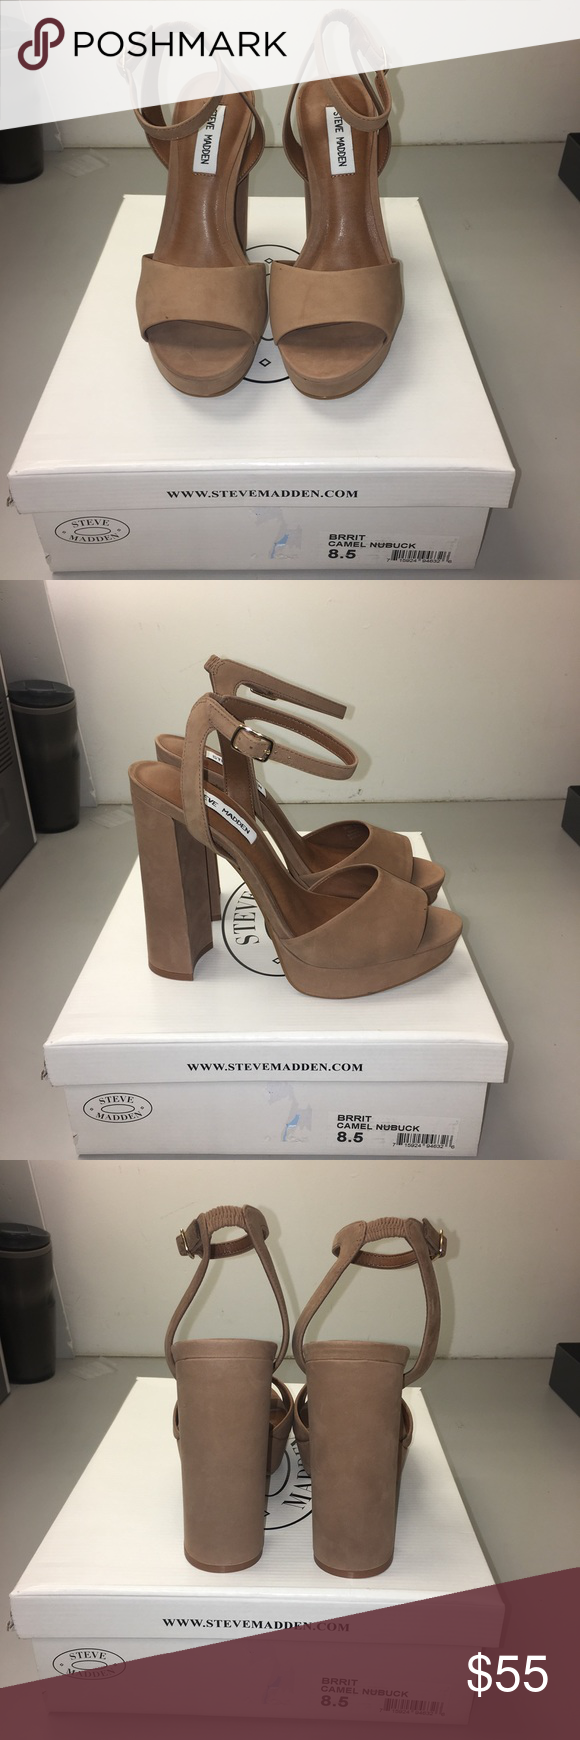 Steve Madden Heels brand New with box. Steve Madden Heels dress it up or dress it down !! Steve Madden Shoes Heels